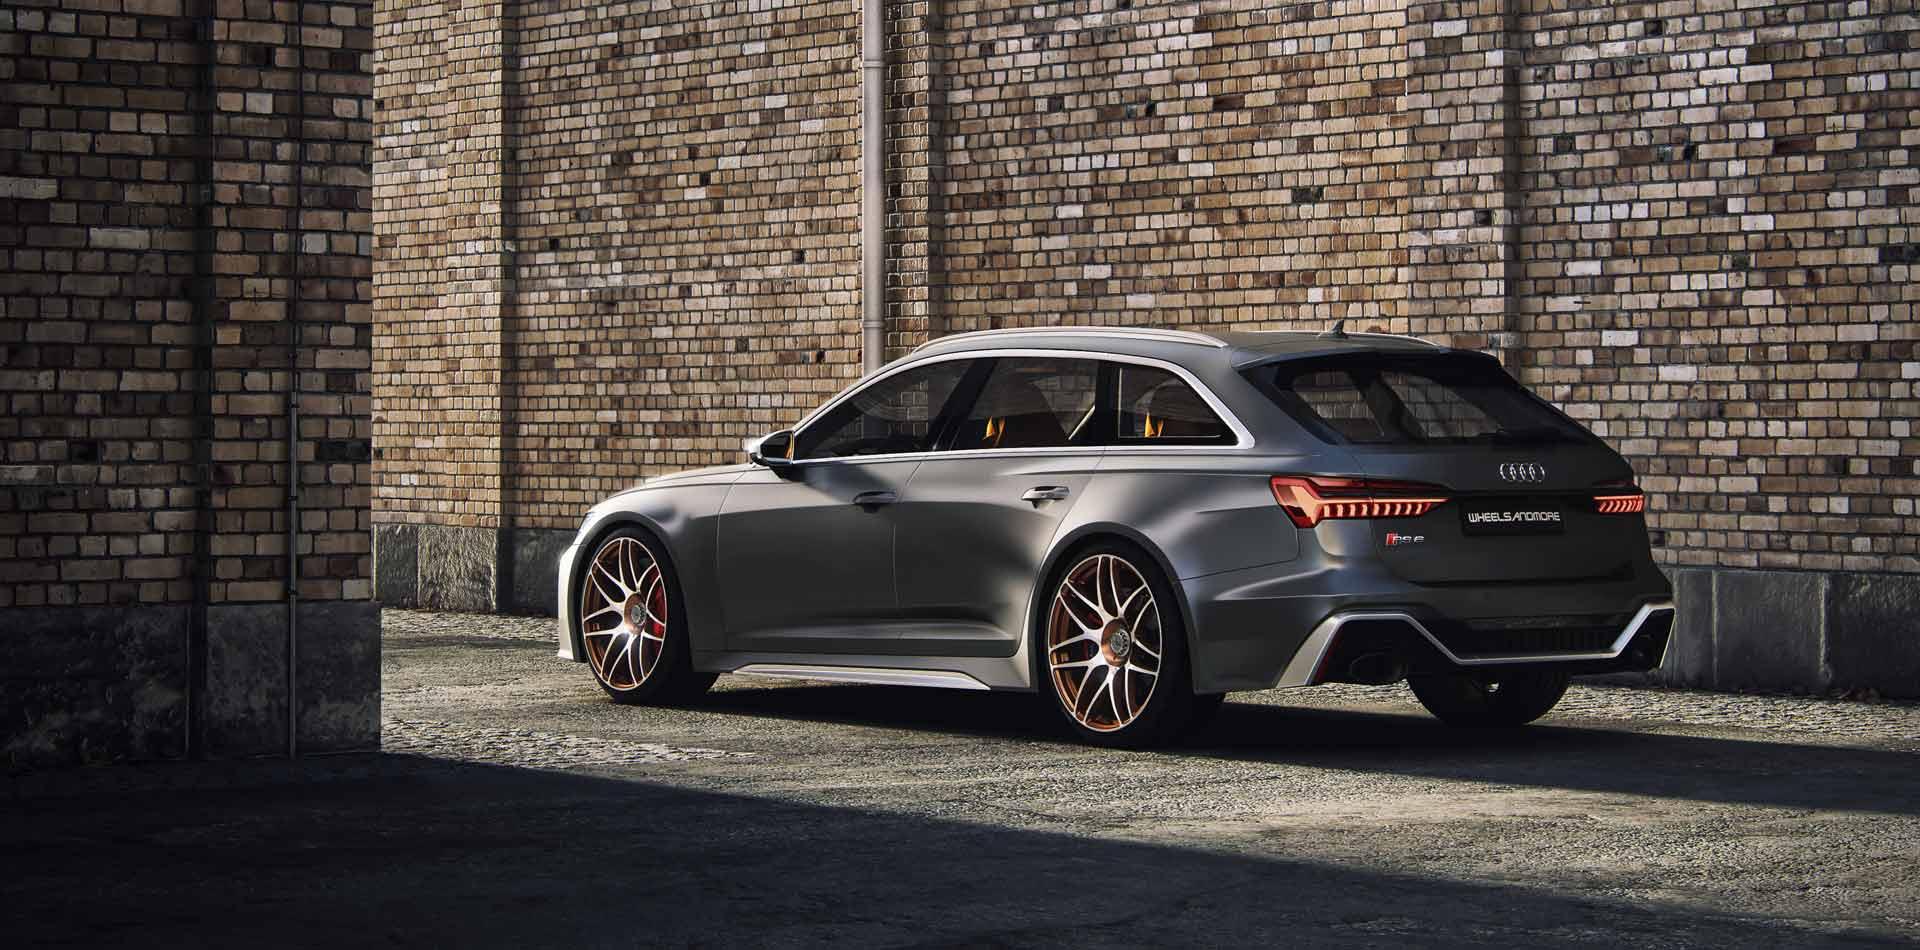 Audi RS6 C8 @Tentension Wheelsandmore 2020